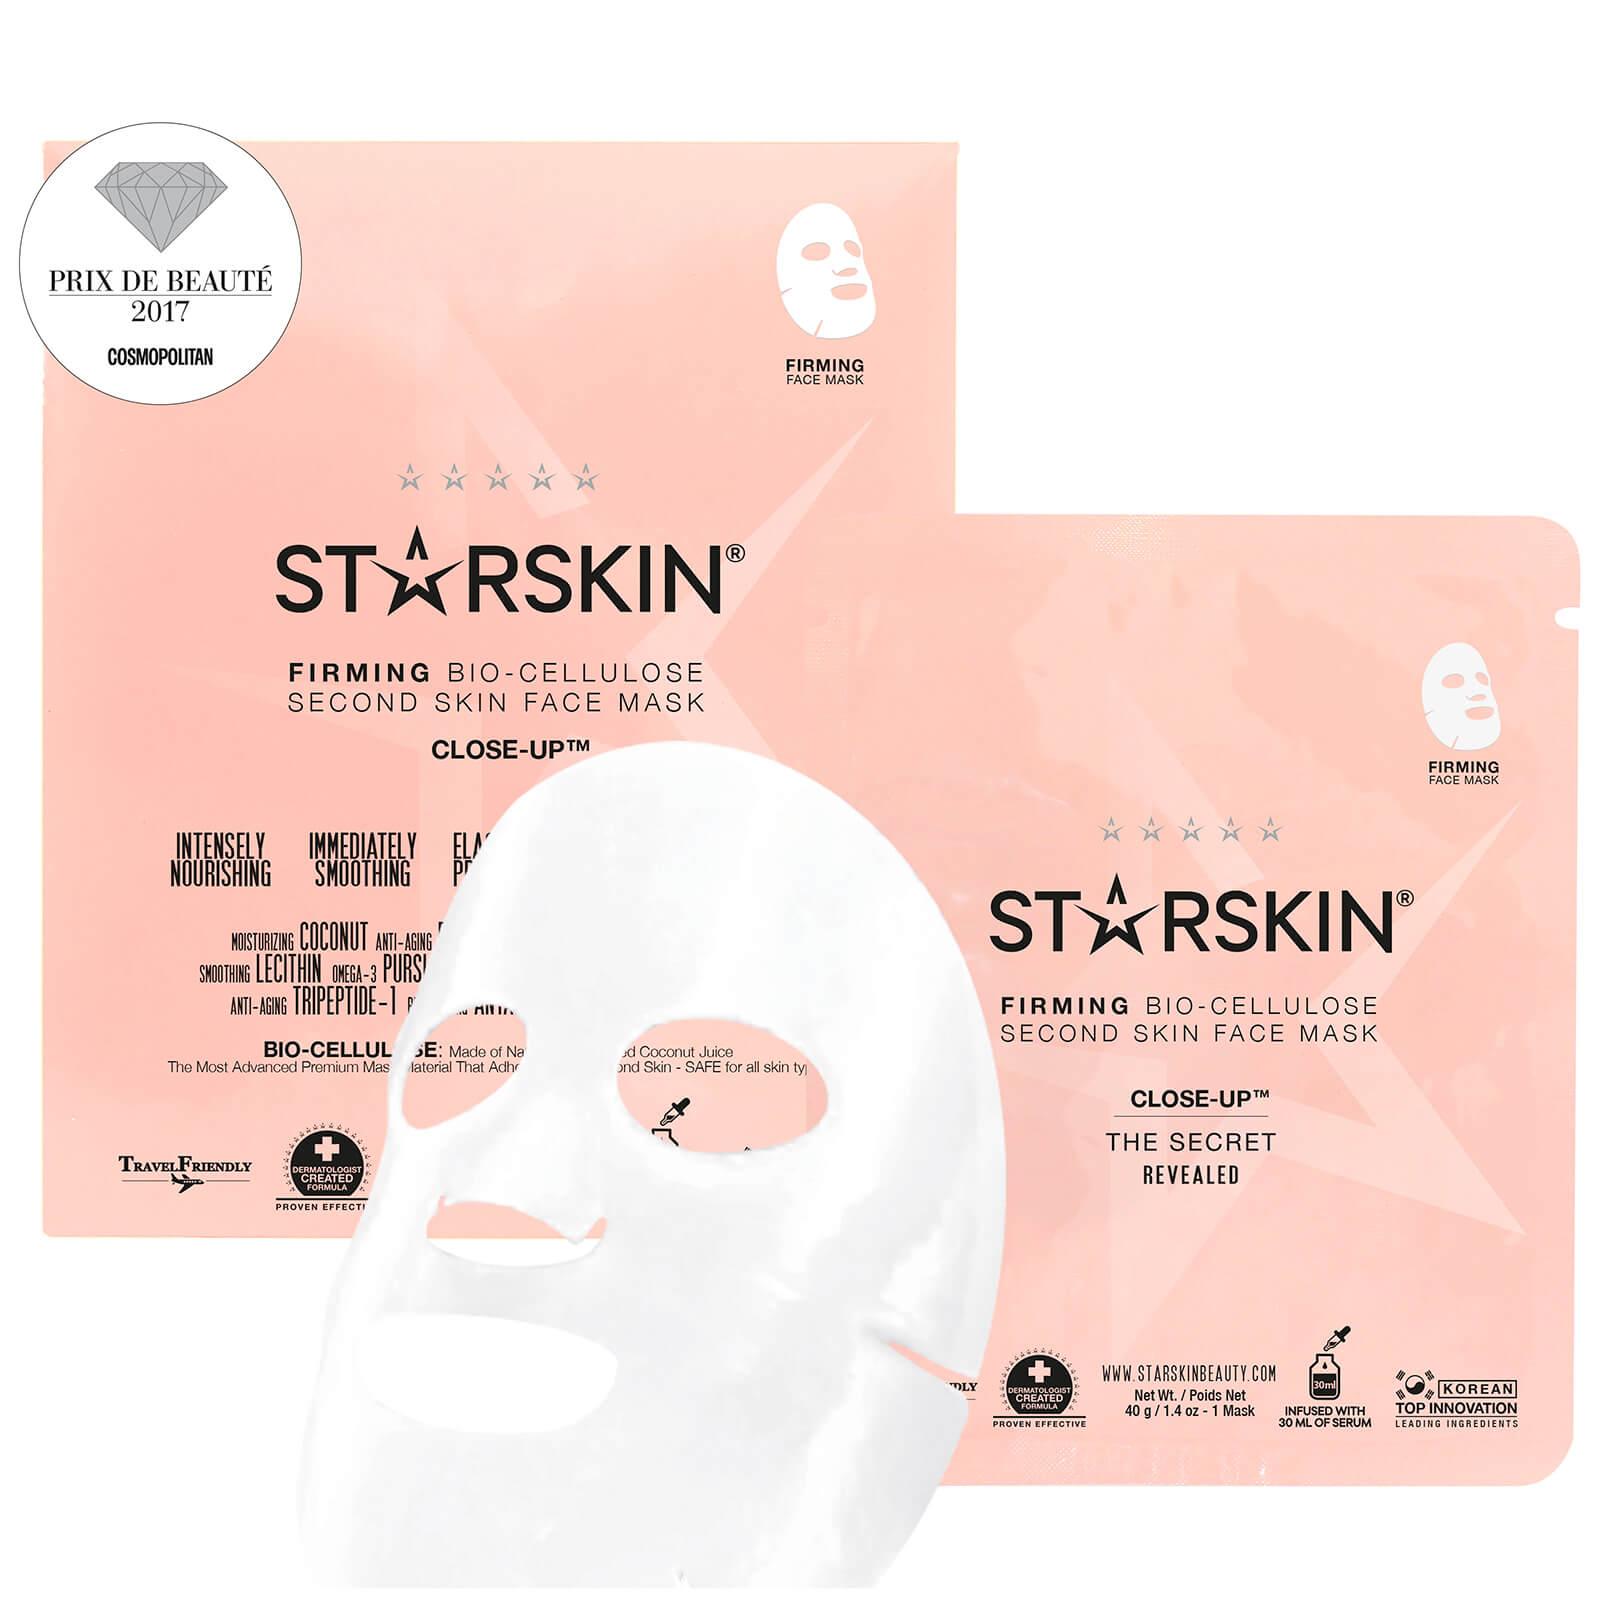 STARSKIN Masque Visage Raffermissant Seconde Peau Noix de Coco Bio-Cellulose Close-Up™ STARSKIN